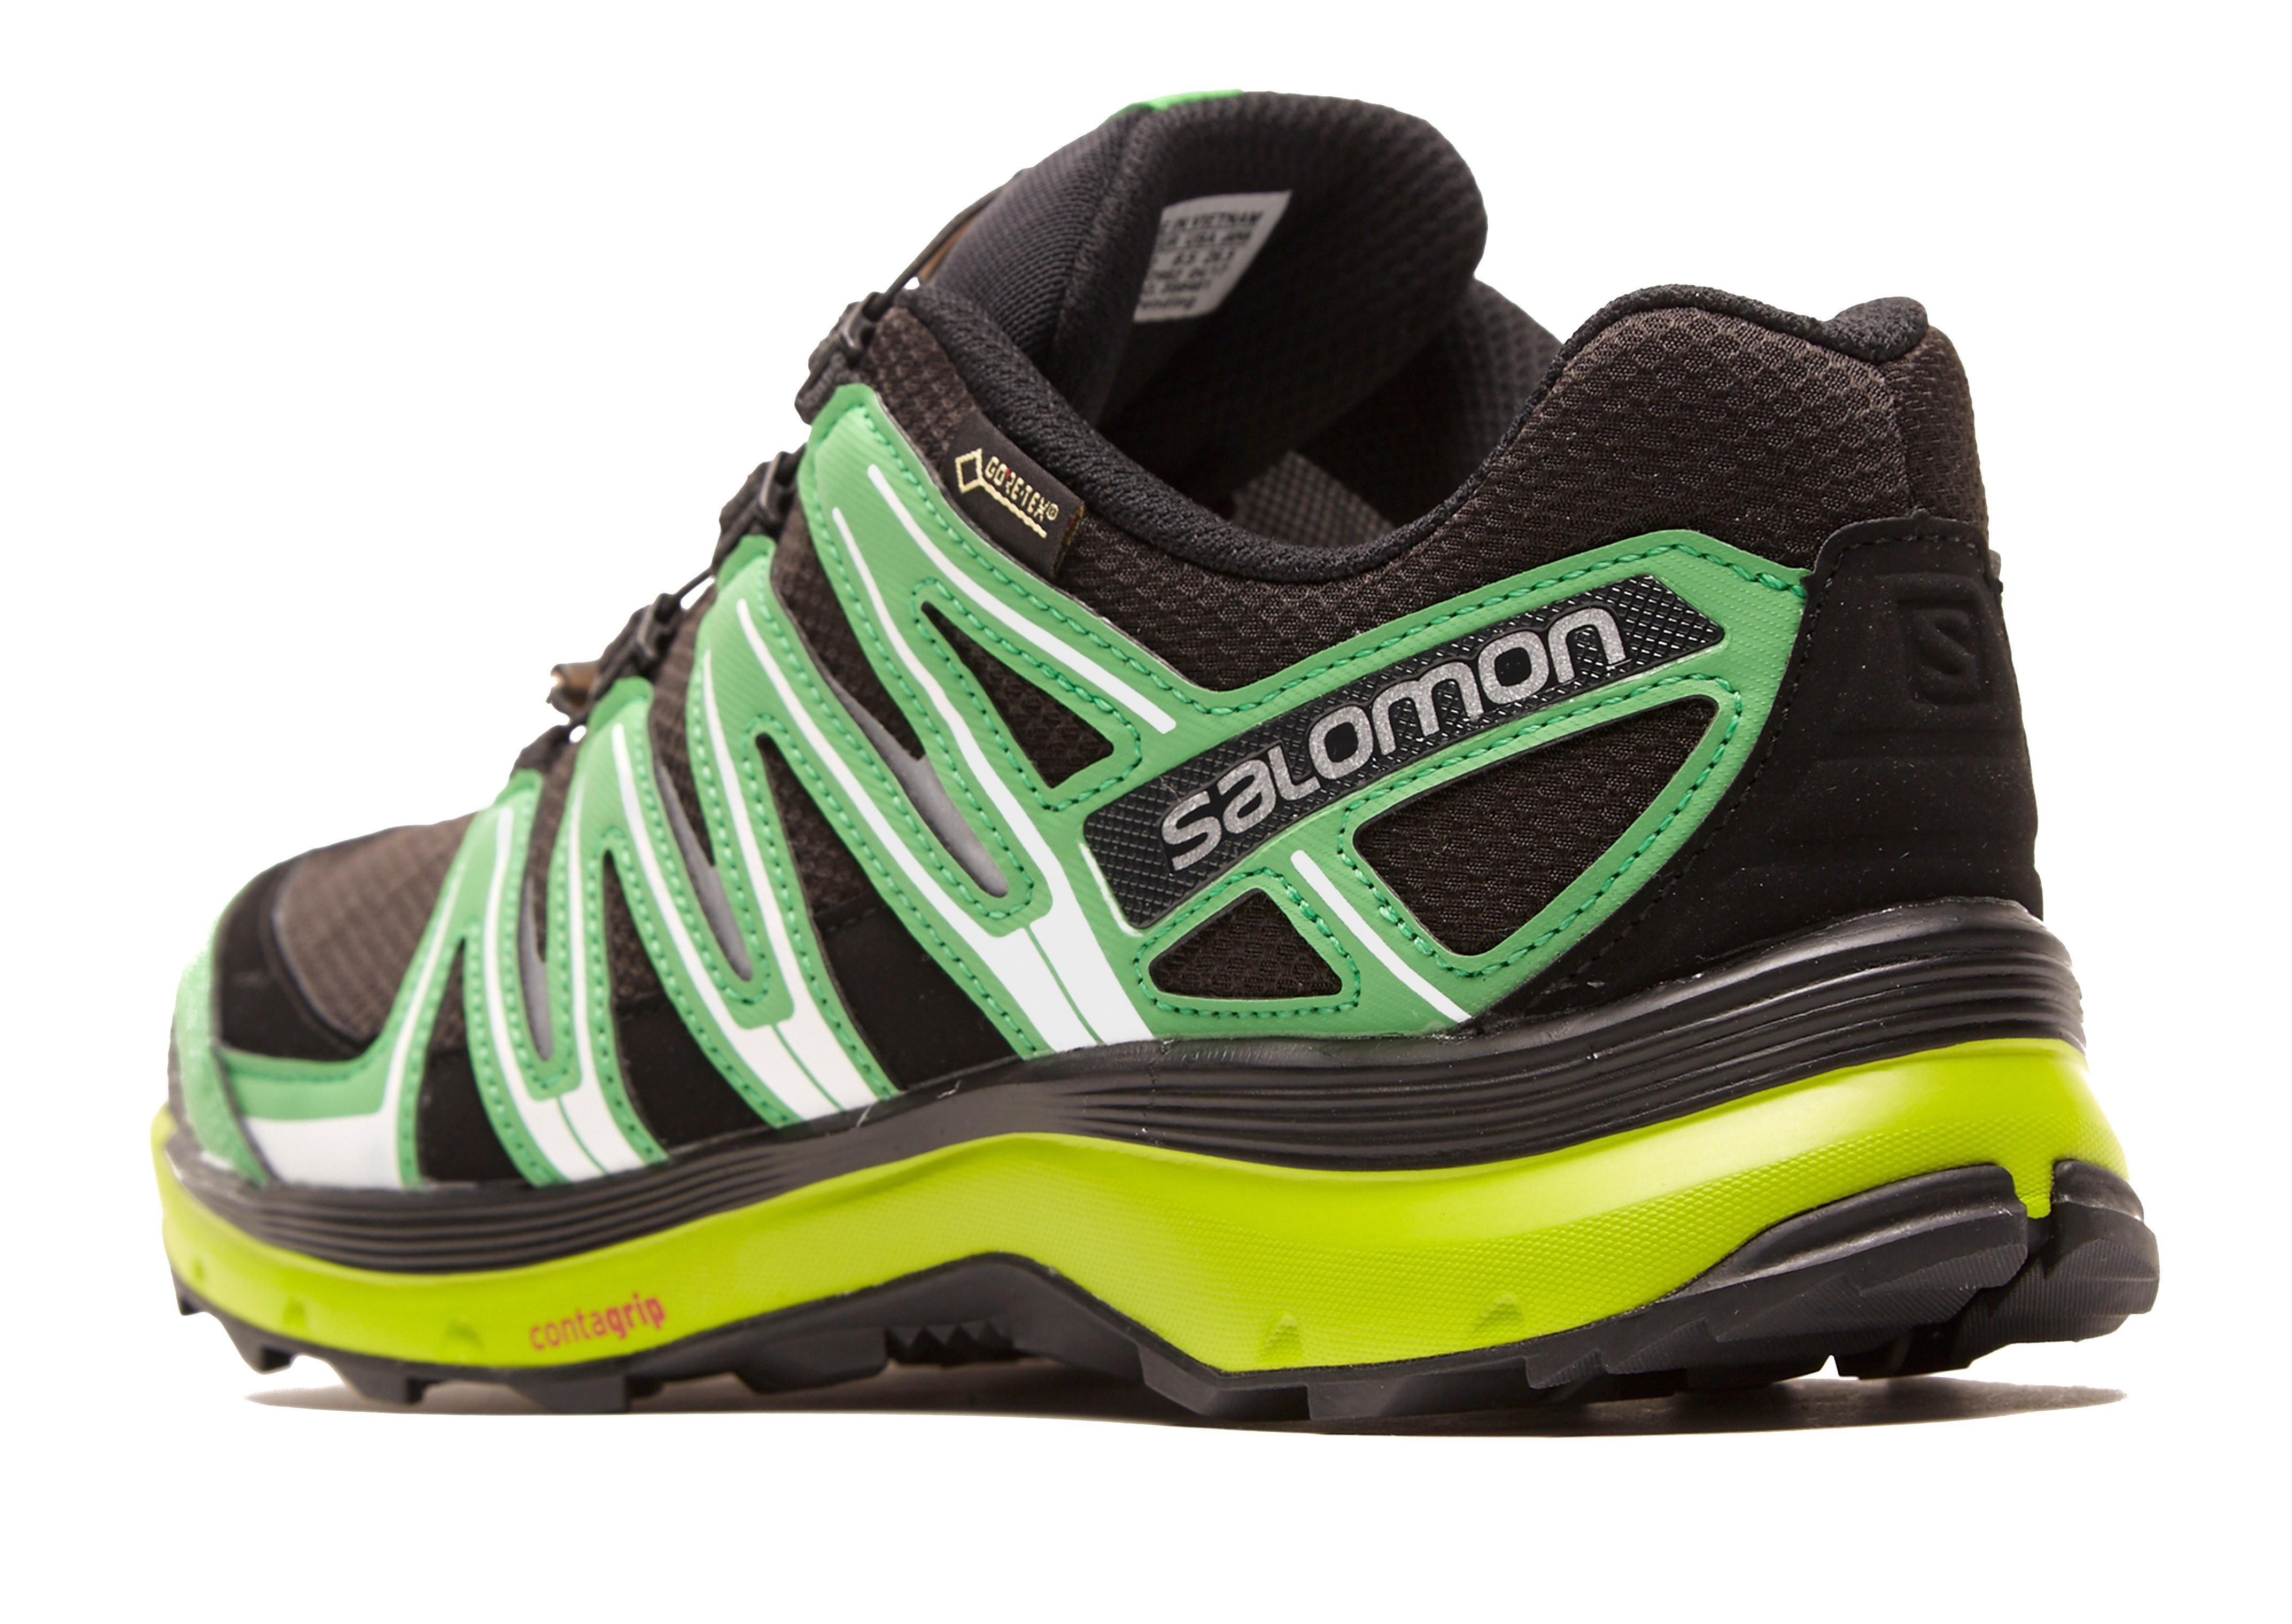 Salomon Salomon XA Lite GTX Trail Running Shoes